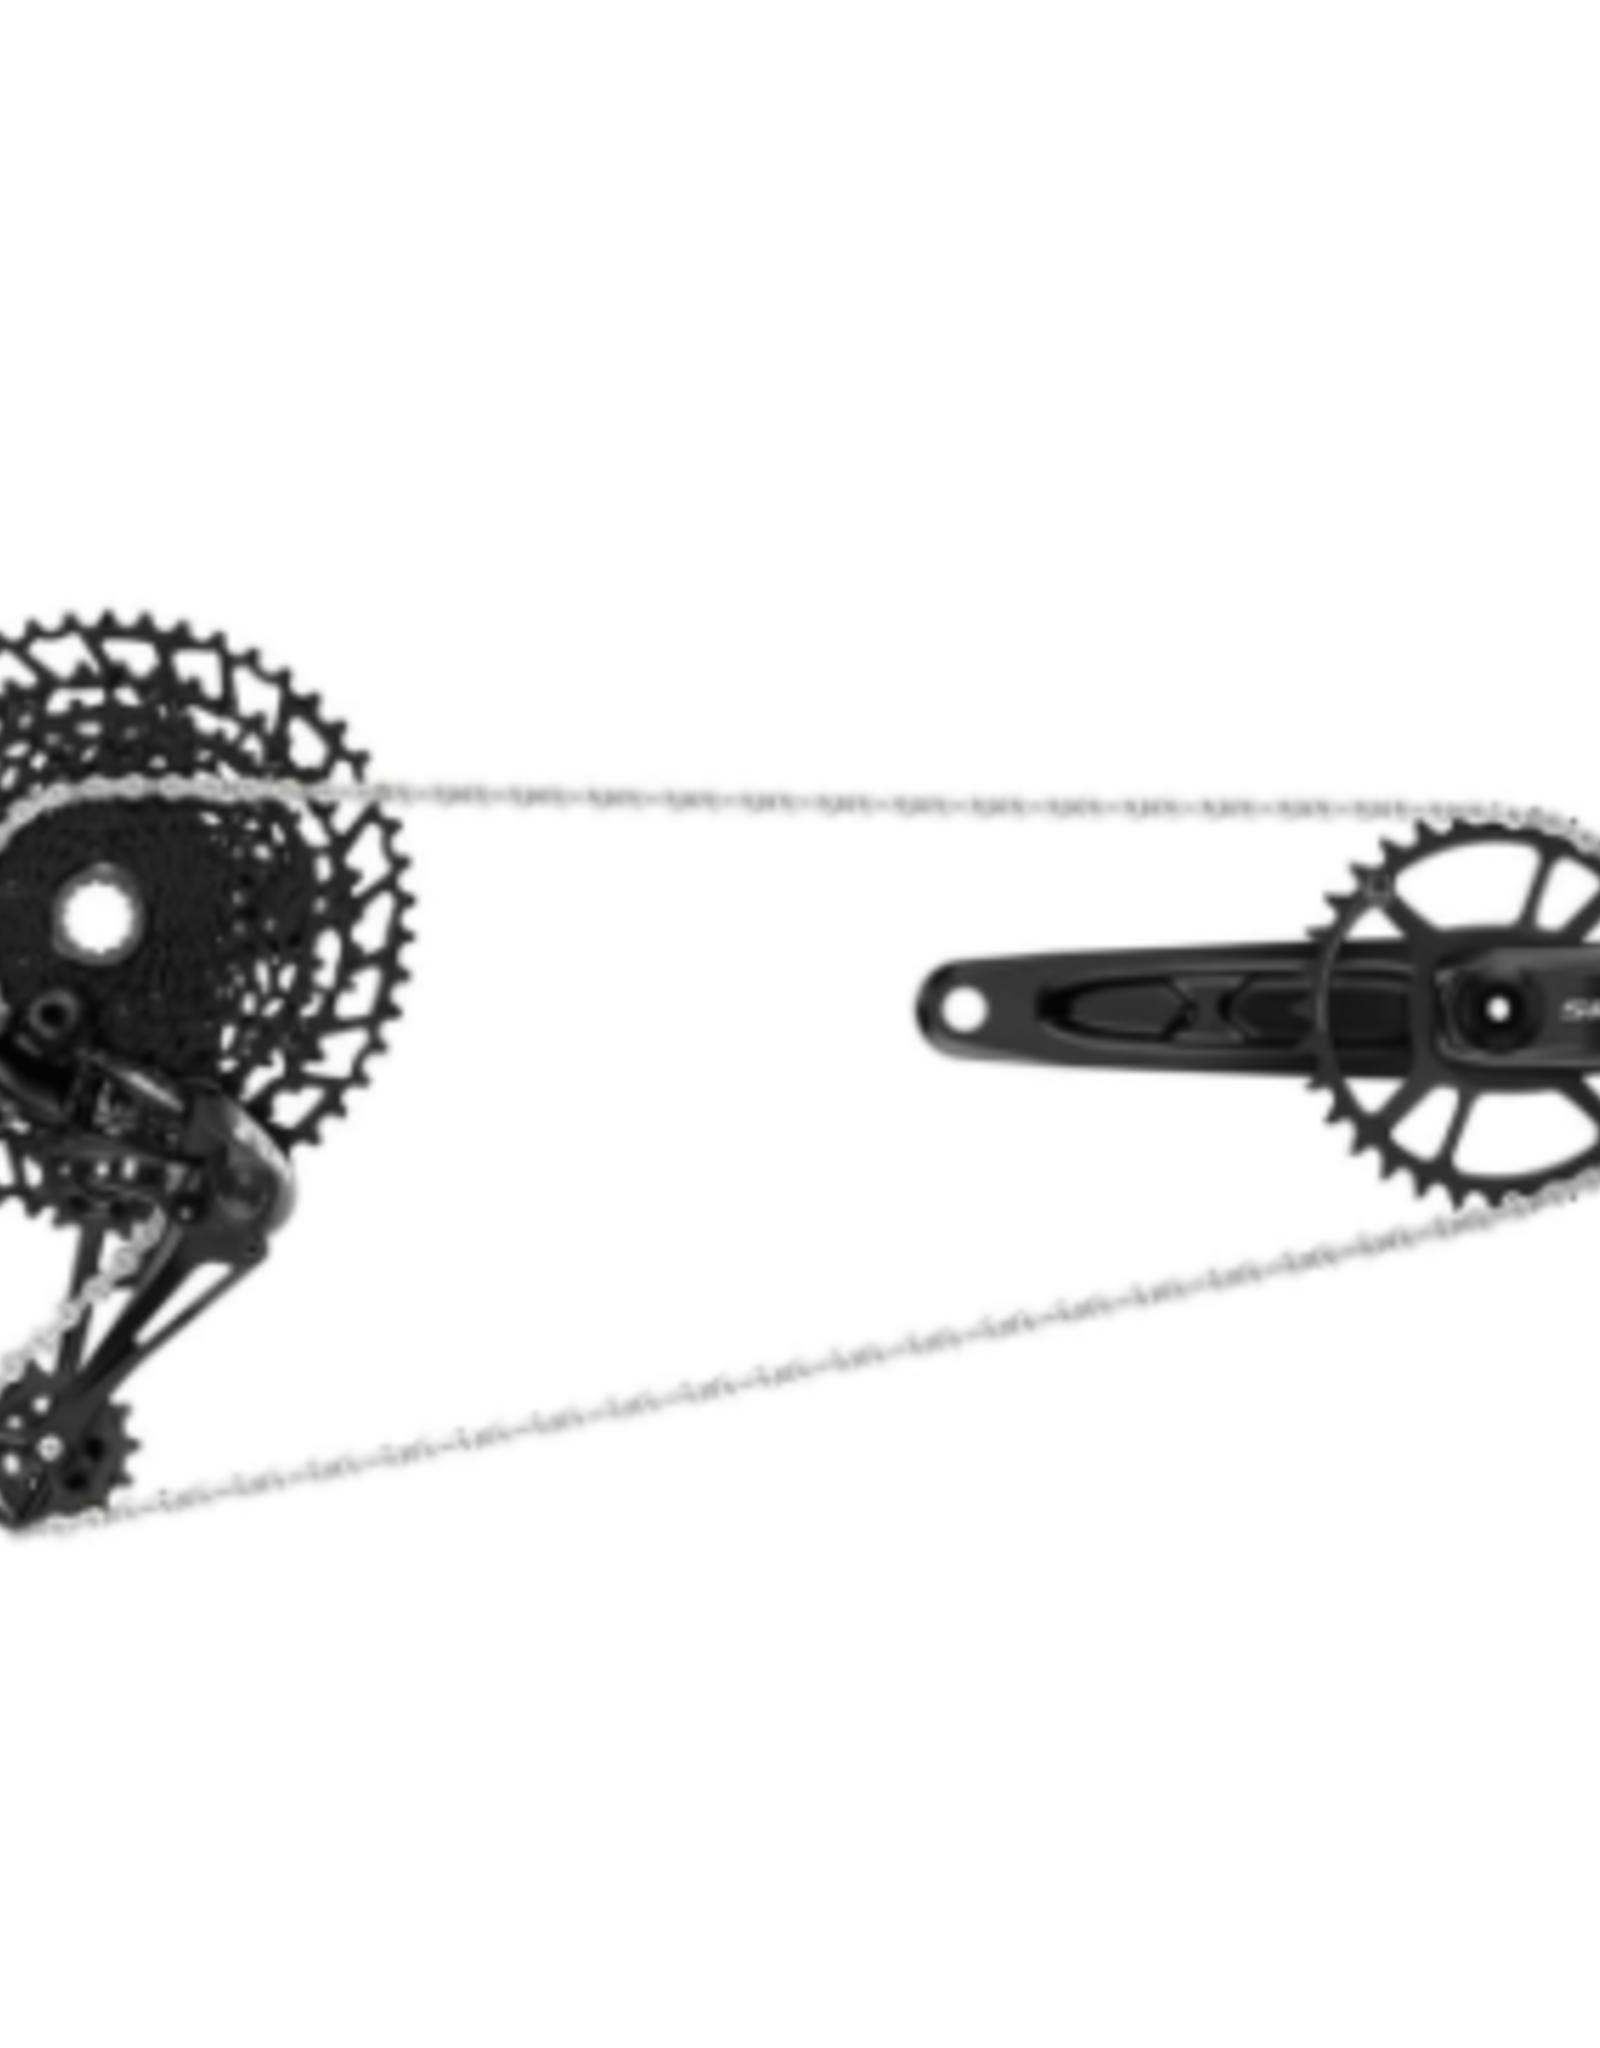 srAM Sram NX Eagle Dub Groupset (Rear Derailleur, Trigger shifter with clamp, Crankset Dub 12s with Direct Mount 32t x-Sync Chainring, Chain 126 Links 12s, Cassette XG-1230 11-50T, Chaingap Gauge): Black 170mm